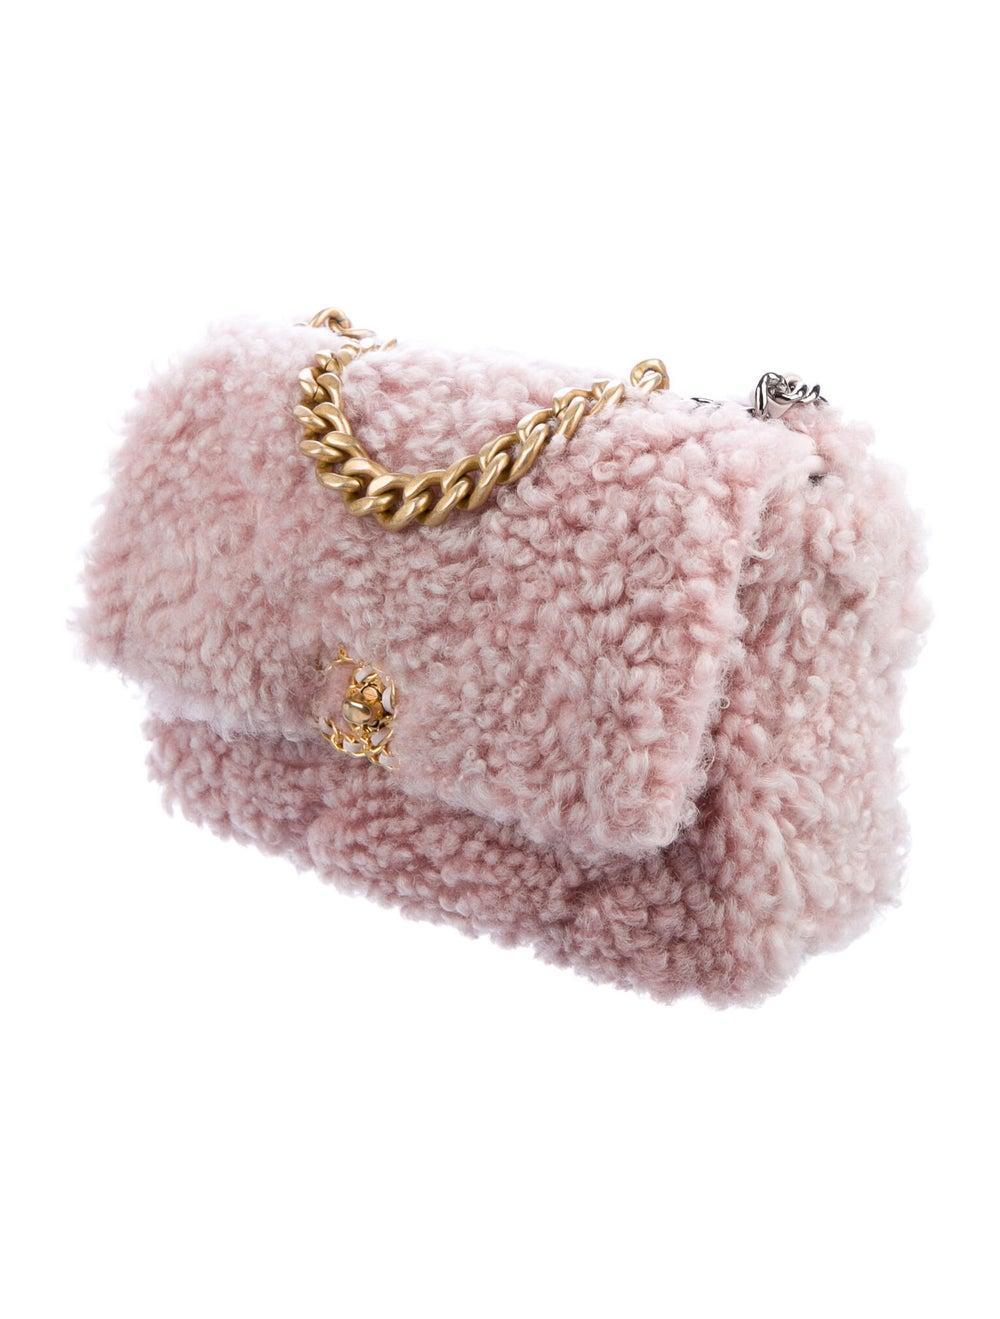 Chanel Shearling 19 Flap Bag Pink - image 3